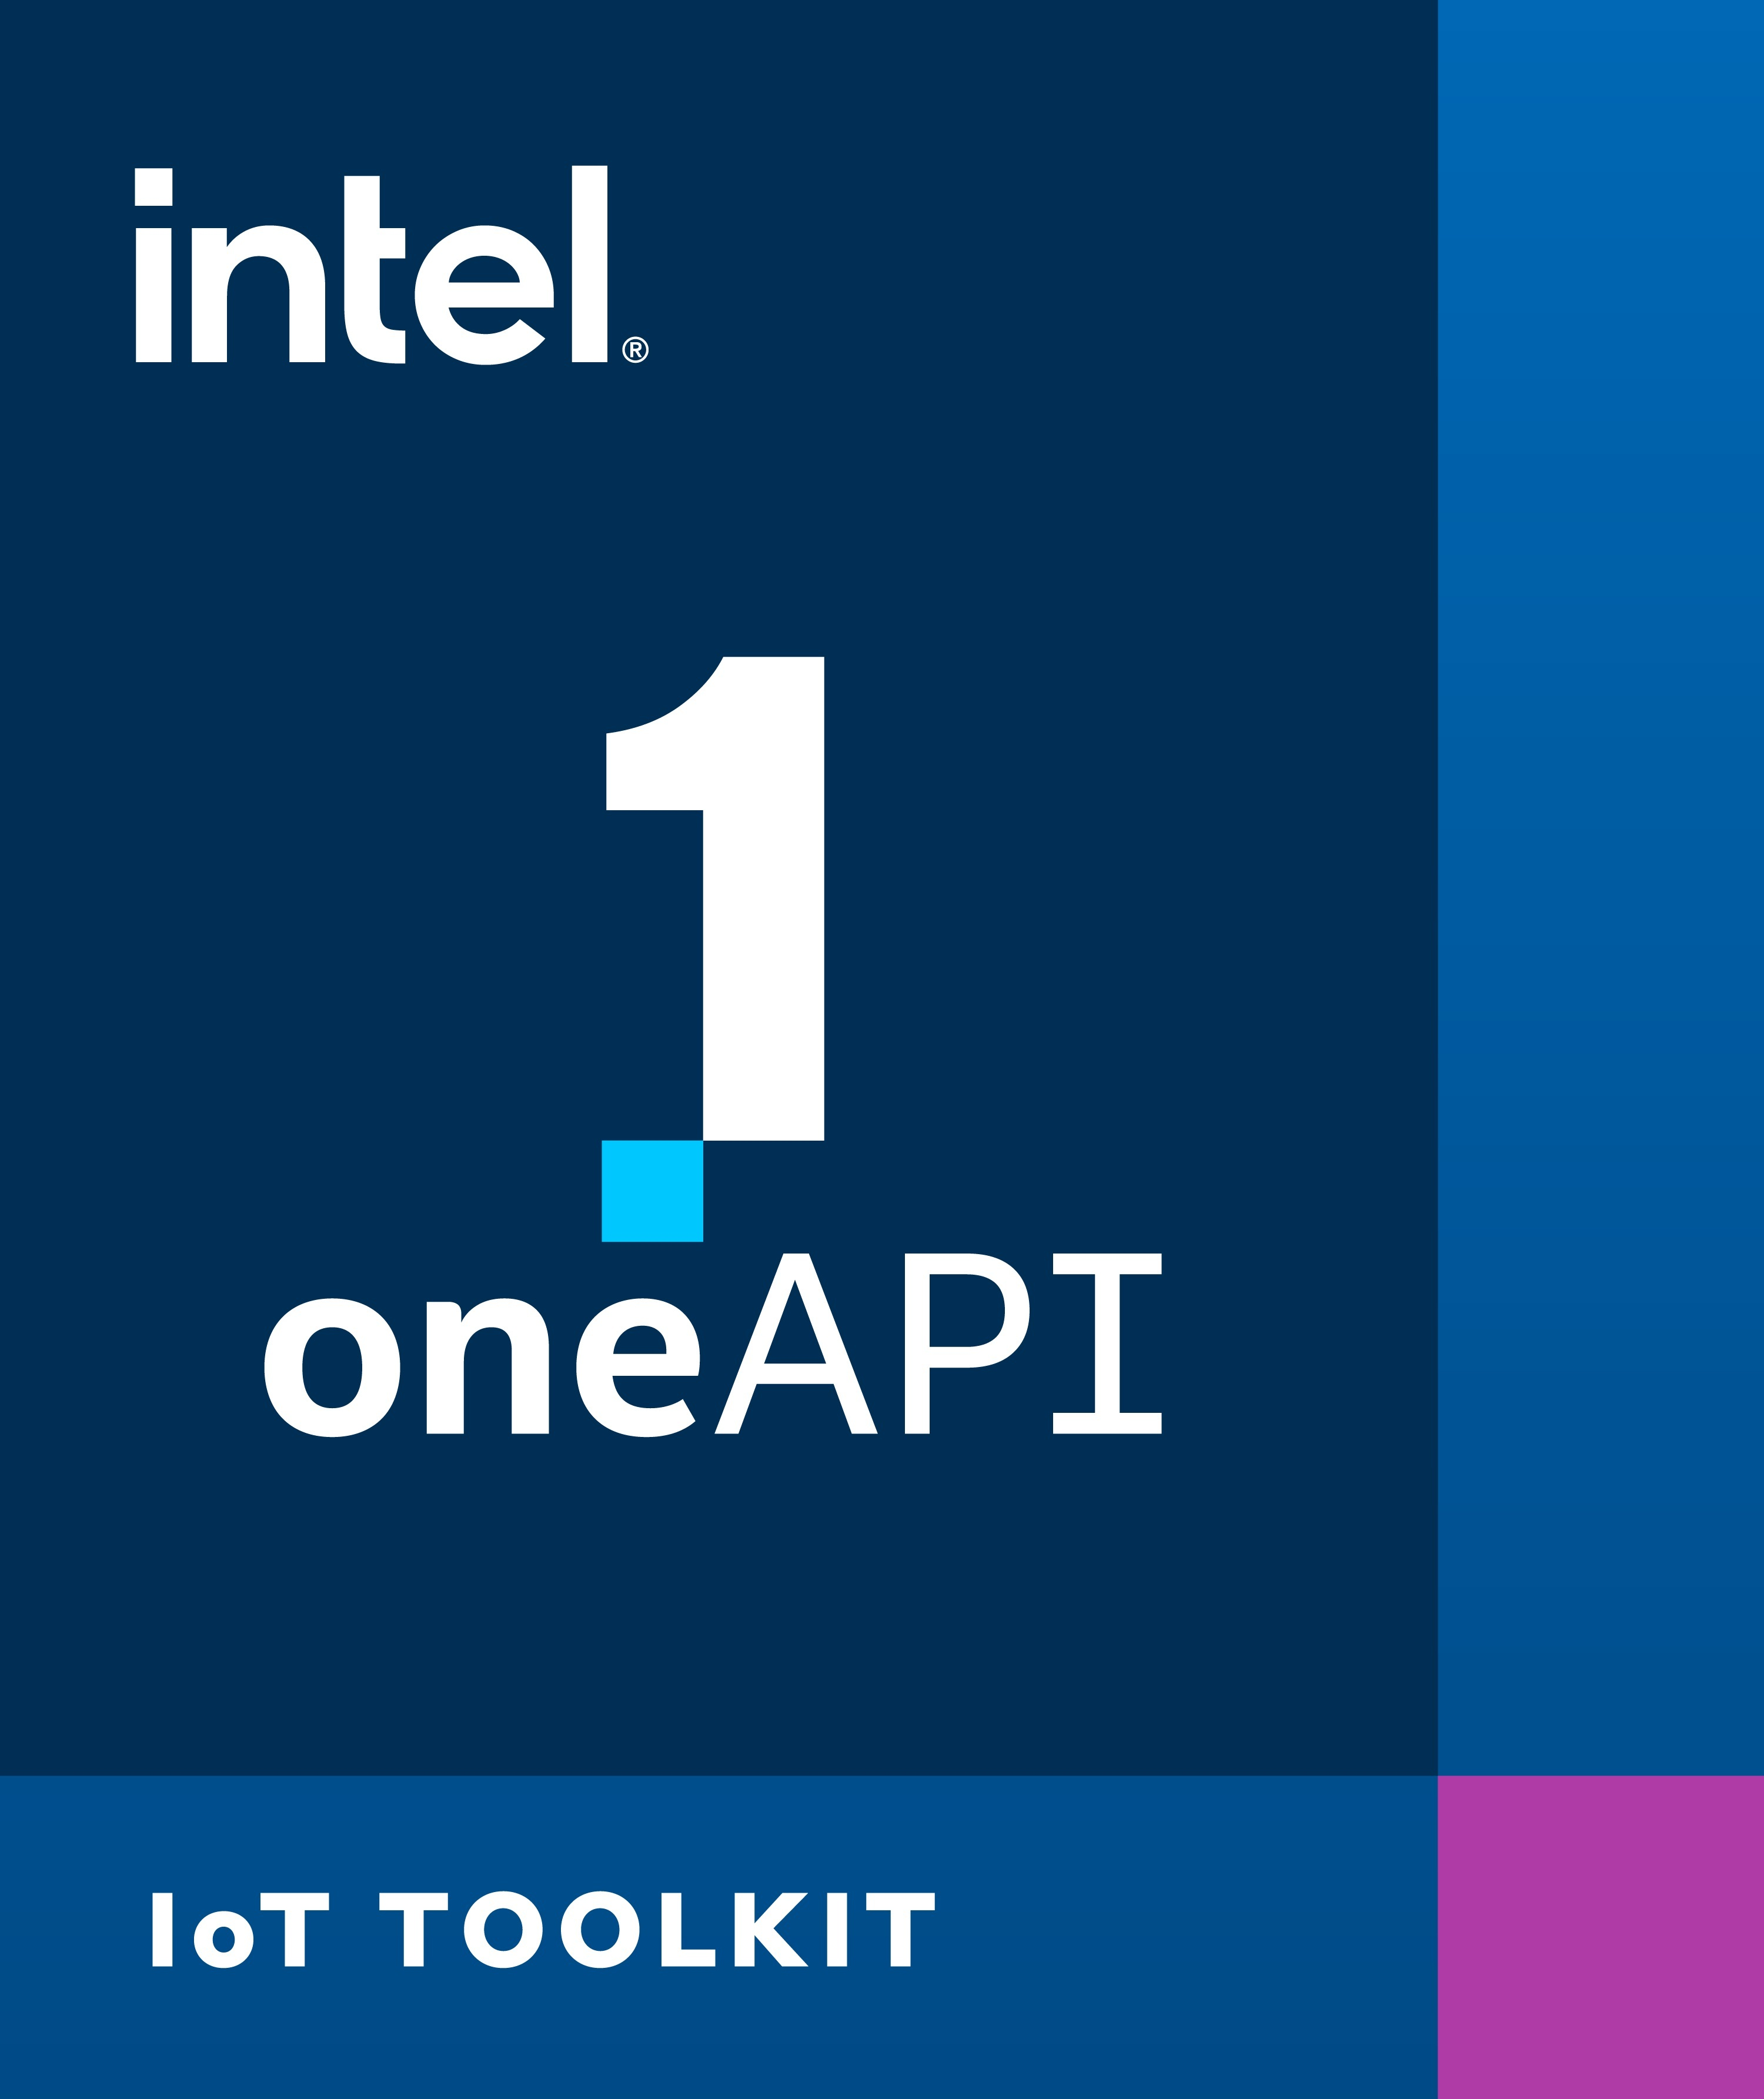 Intel-toolkit-oneAPI-IoT